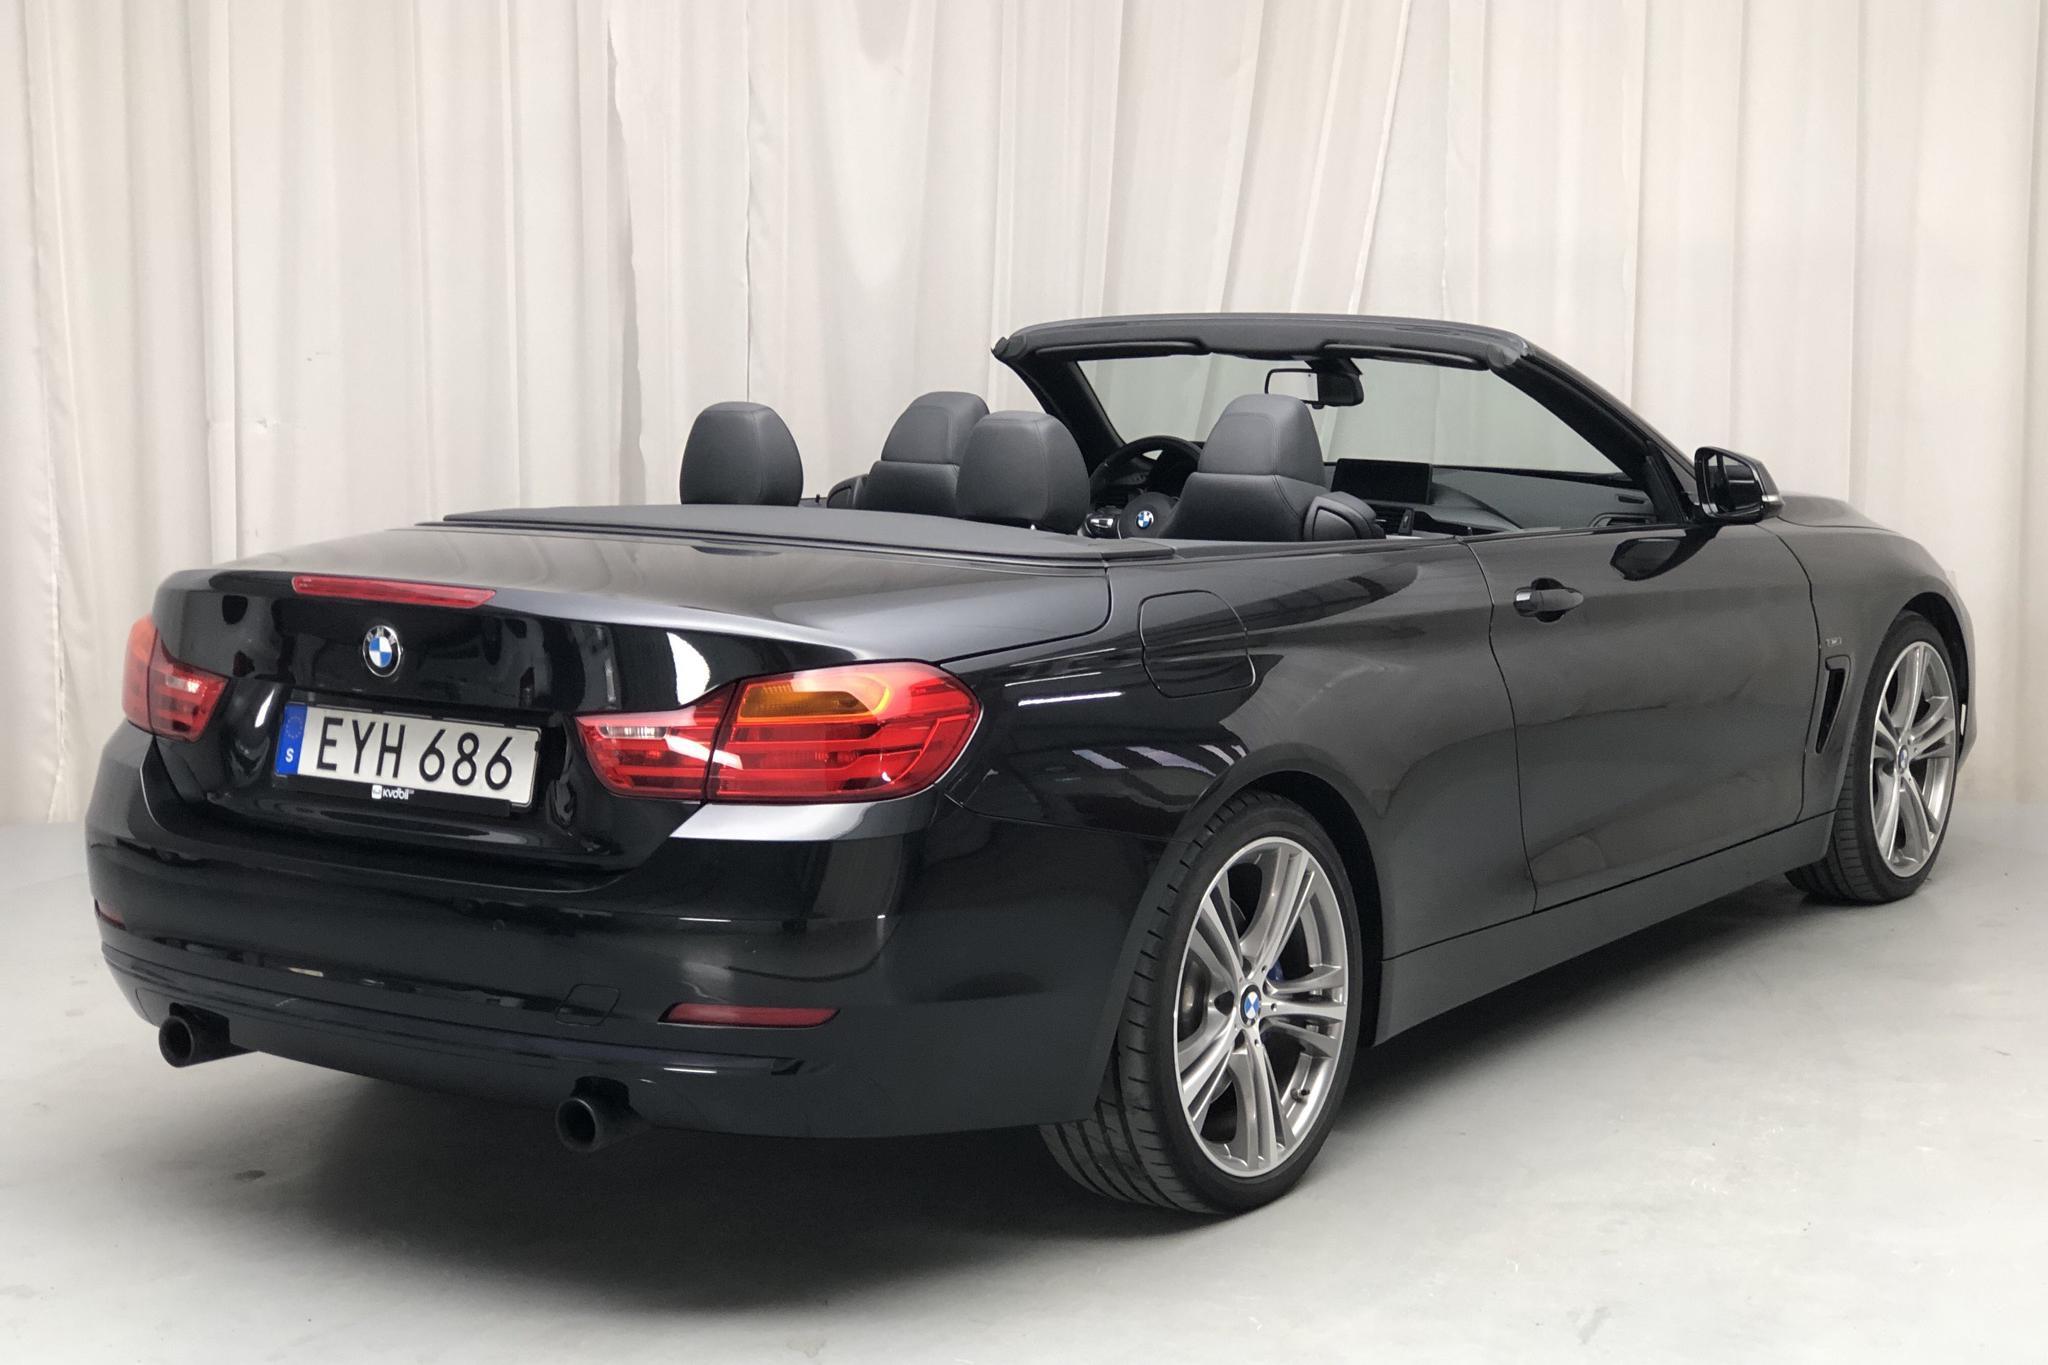 BMW 435i Cabriolet, F33 (306hk) - 60 670 km - Manual - black - 2014